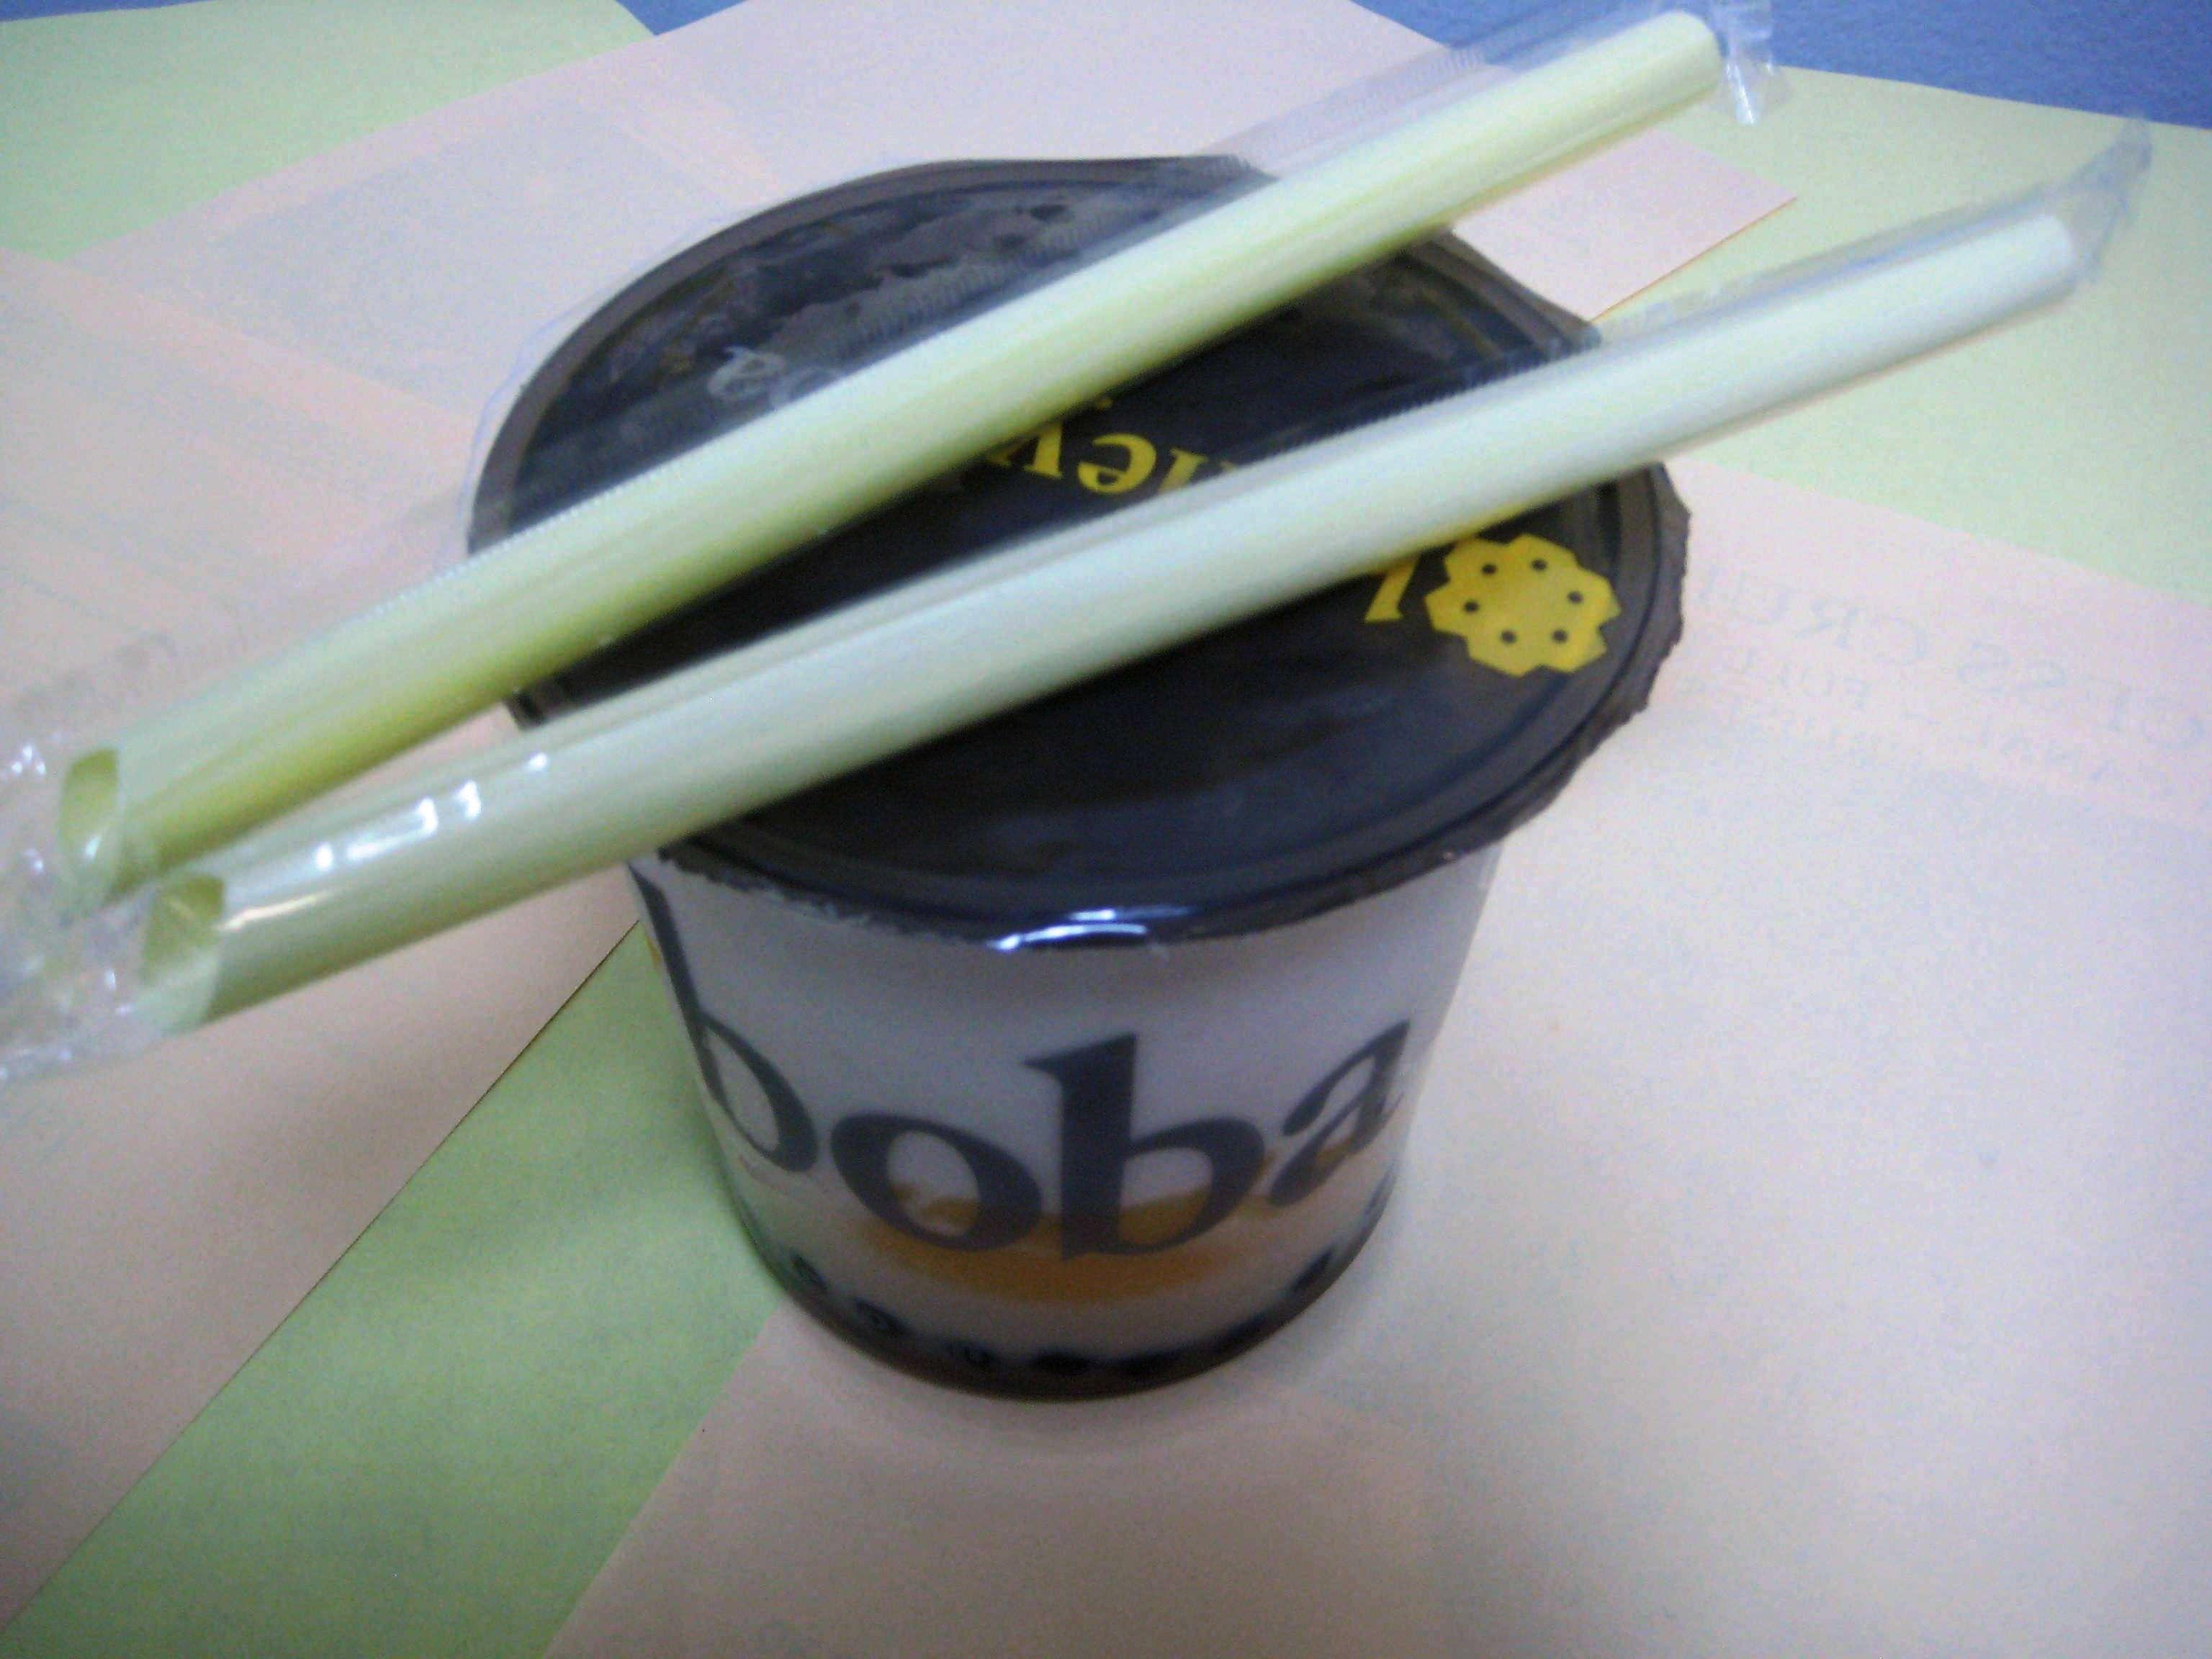 A brief history of boba